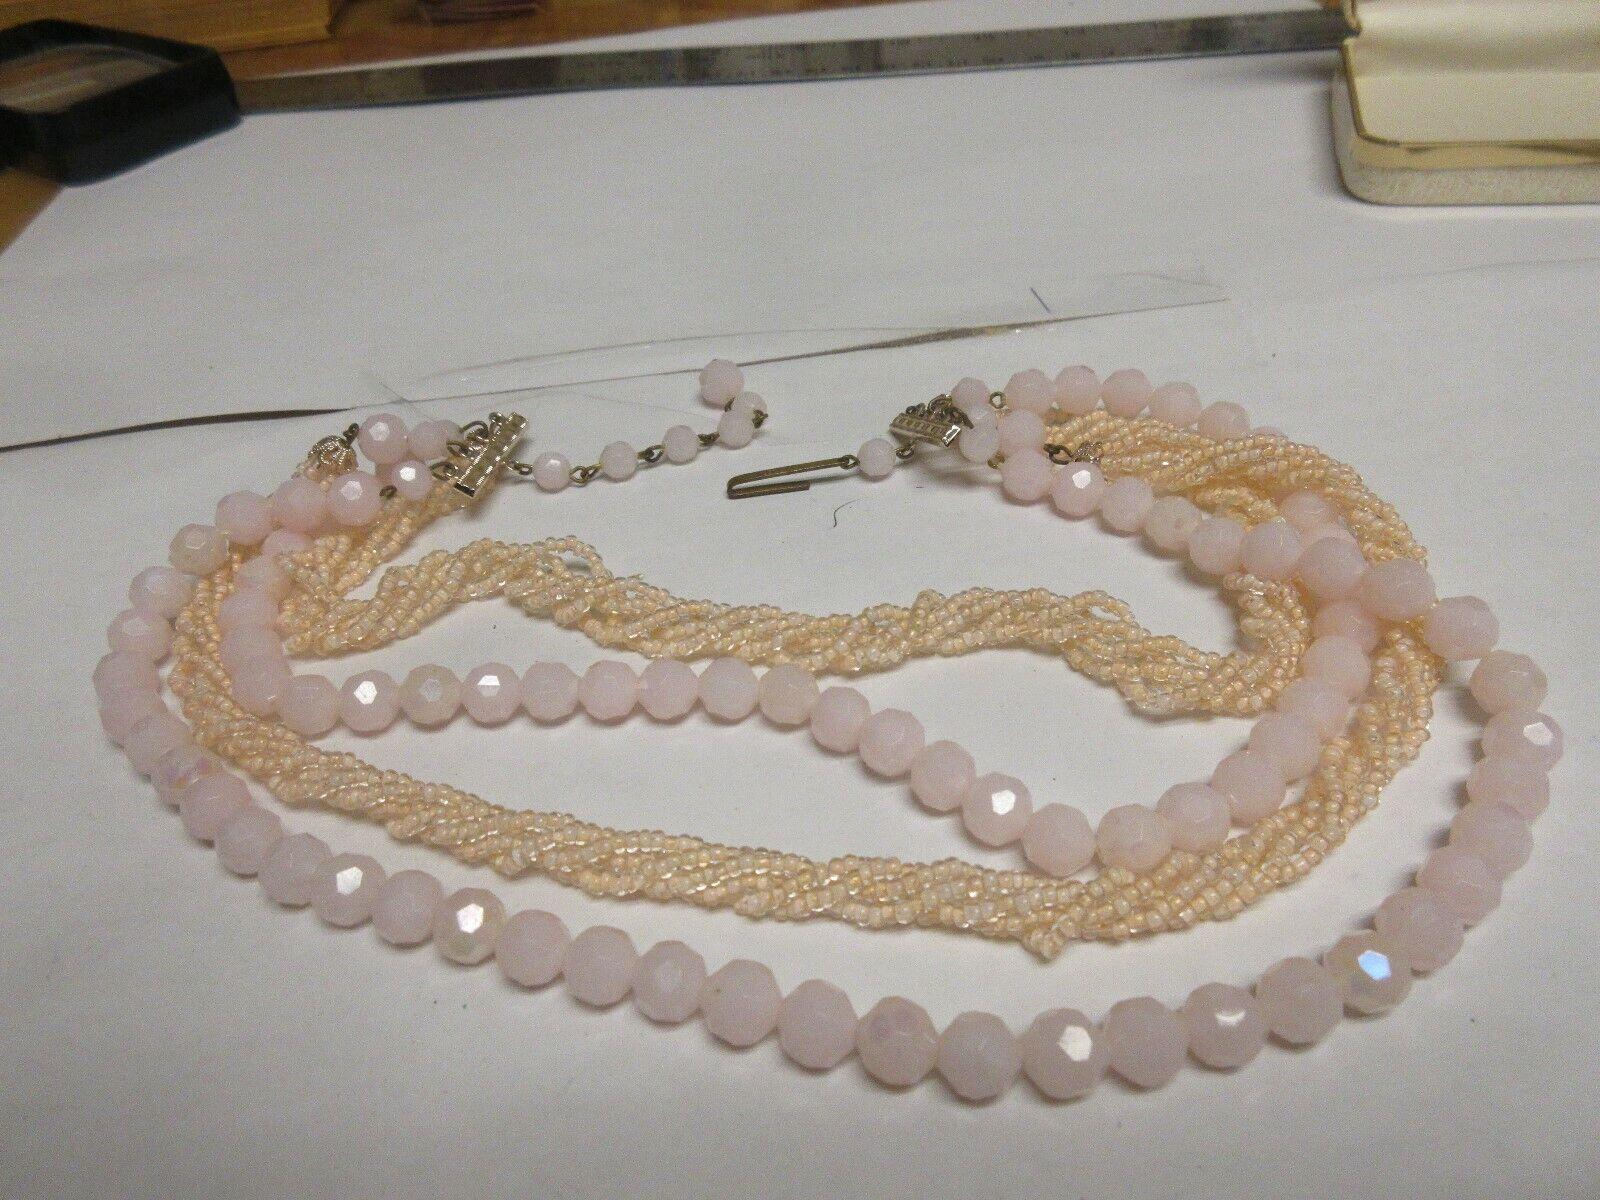 Costume Jewelry,Ladies Necklace ,Pink Rope /Stones ,4St